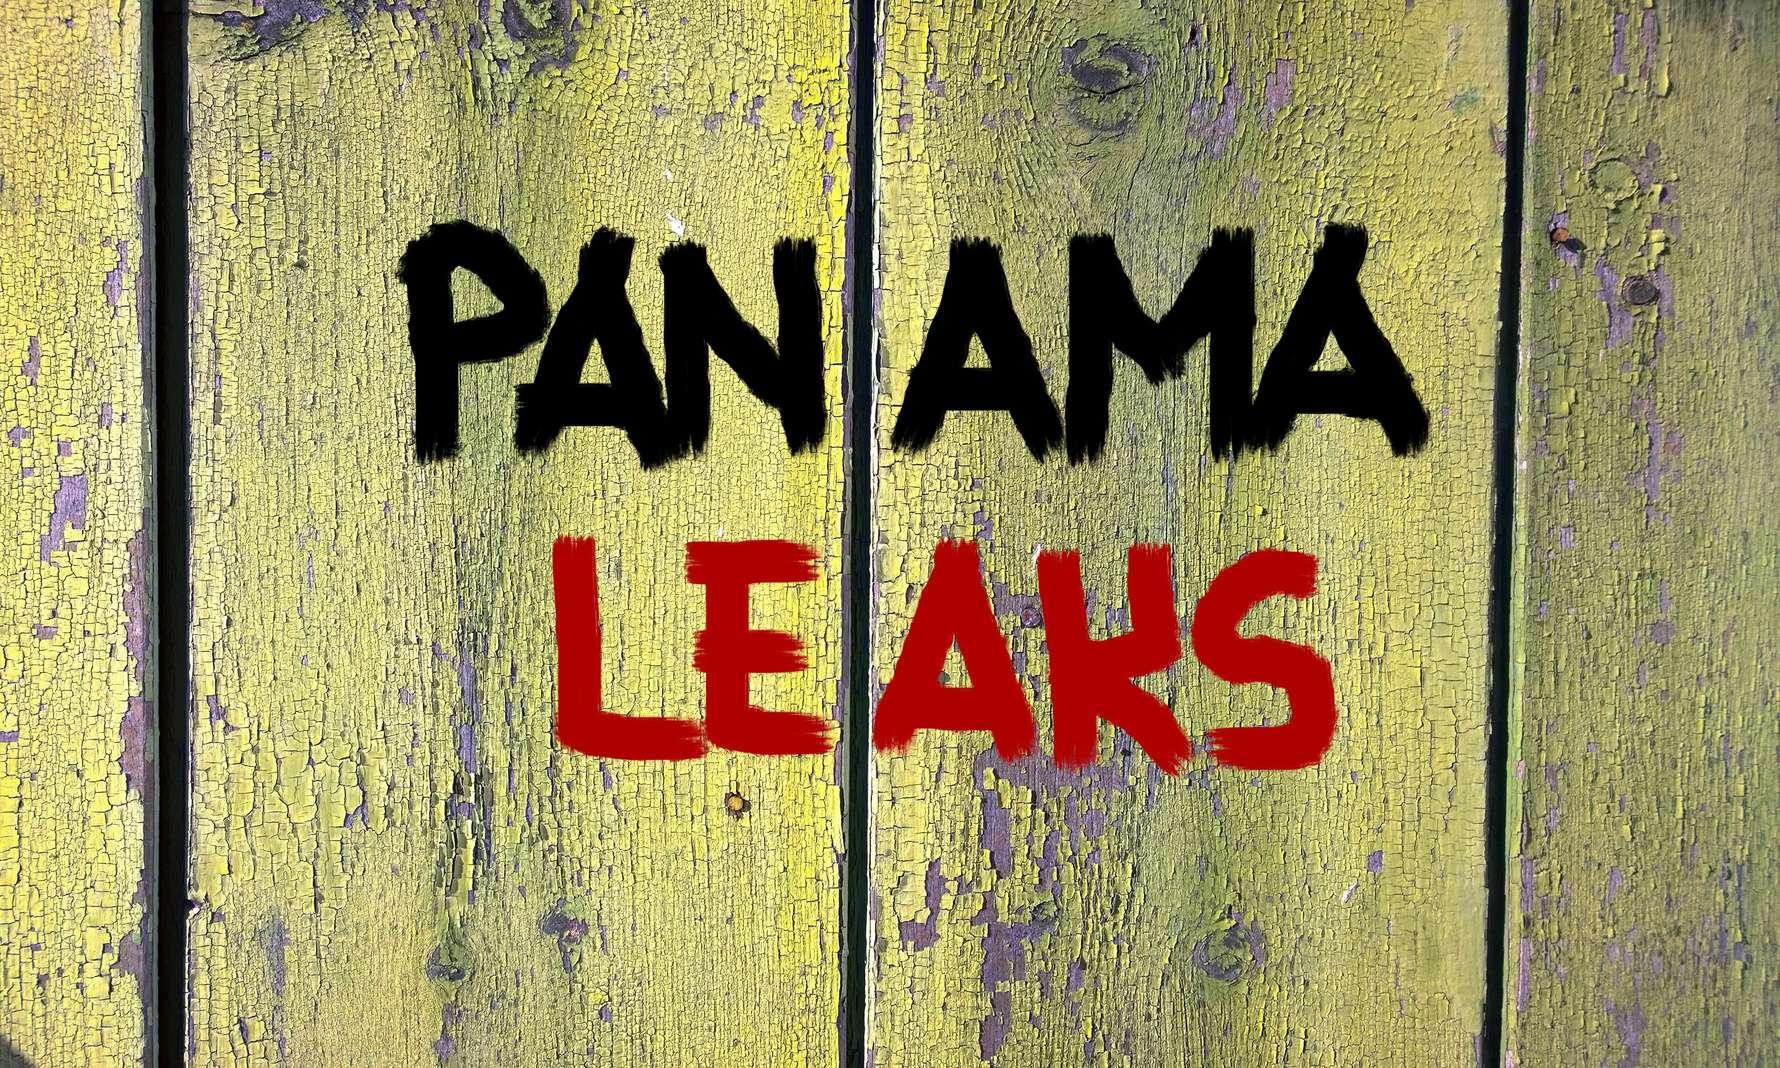 Panama Leaks Concept